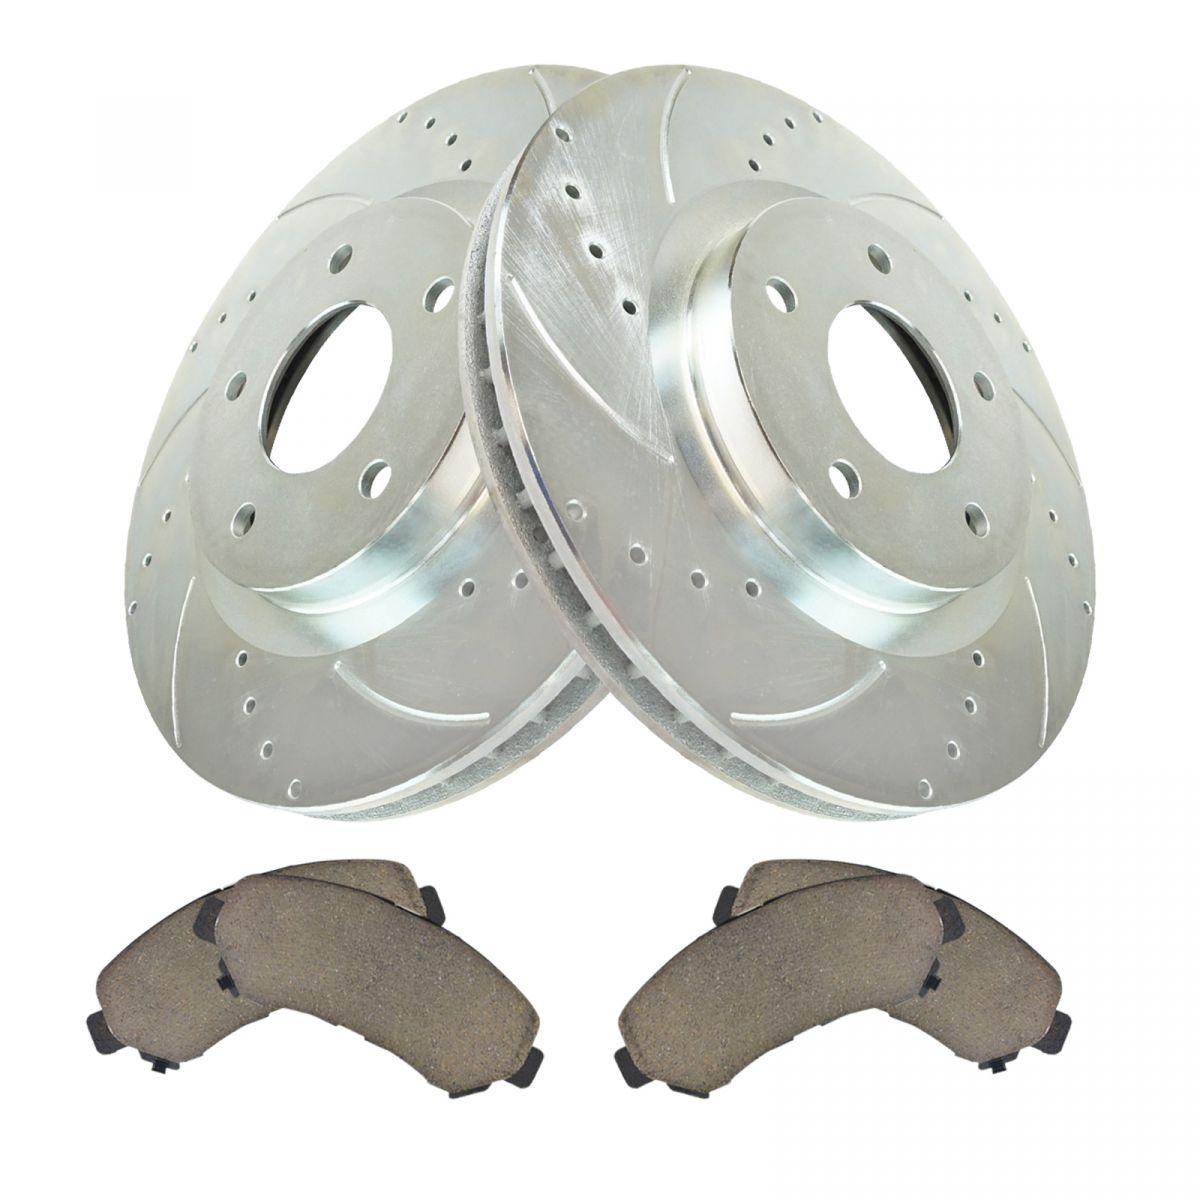 Front Posi Ceramic Disc Brake Pad Performance Cross Drilled Rotor Wheel Hub Kit